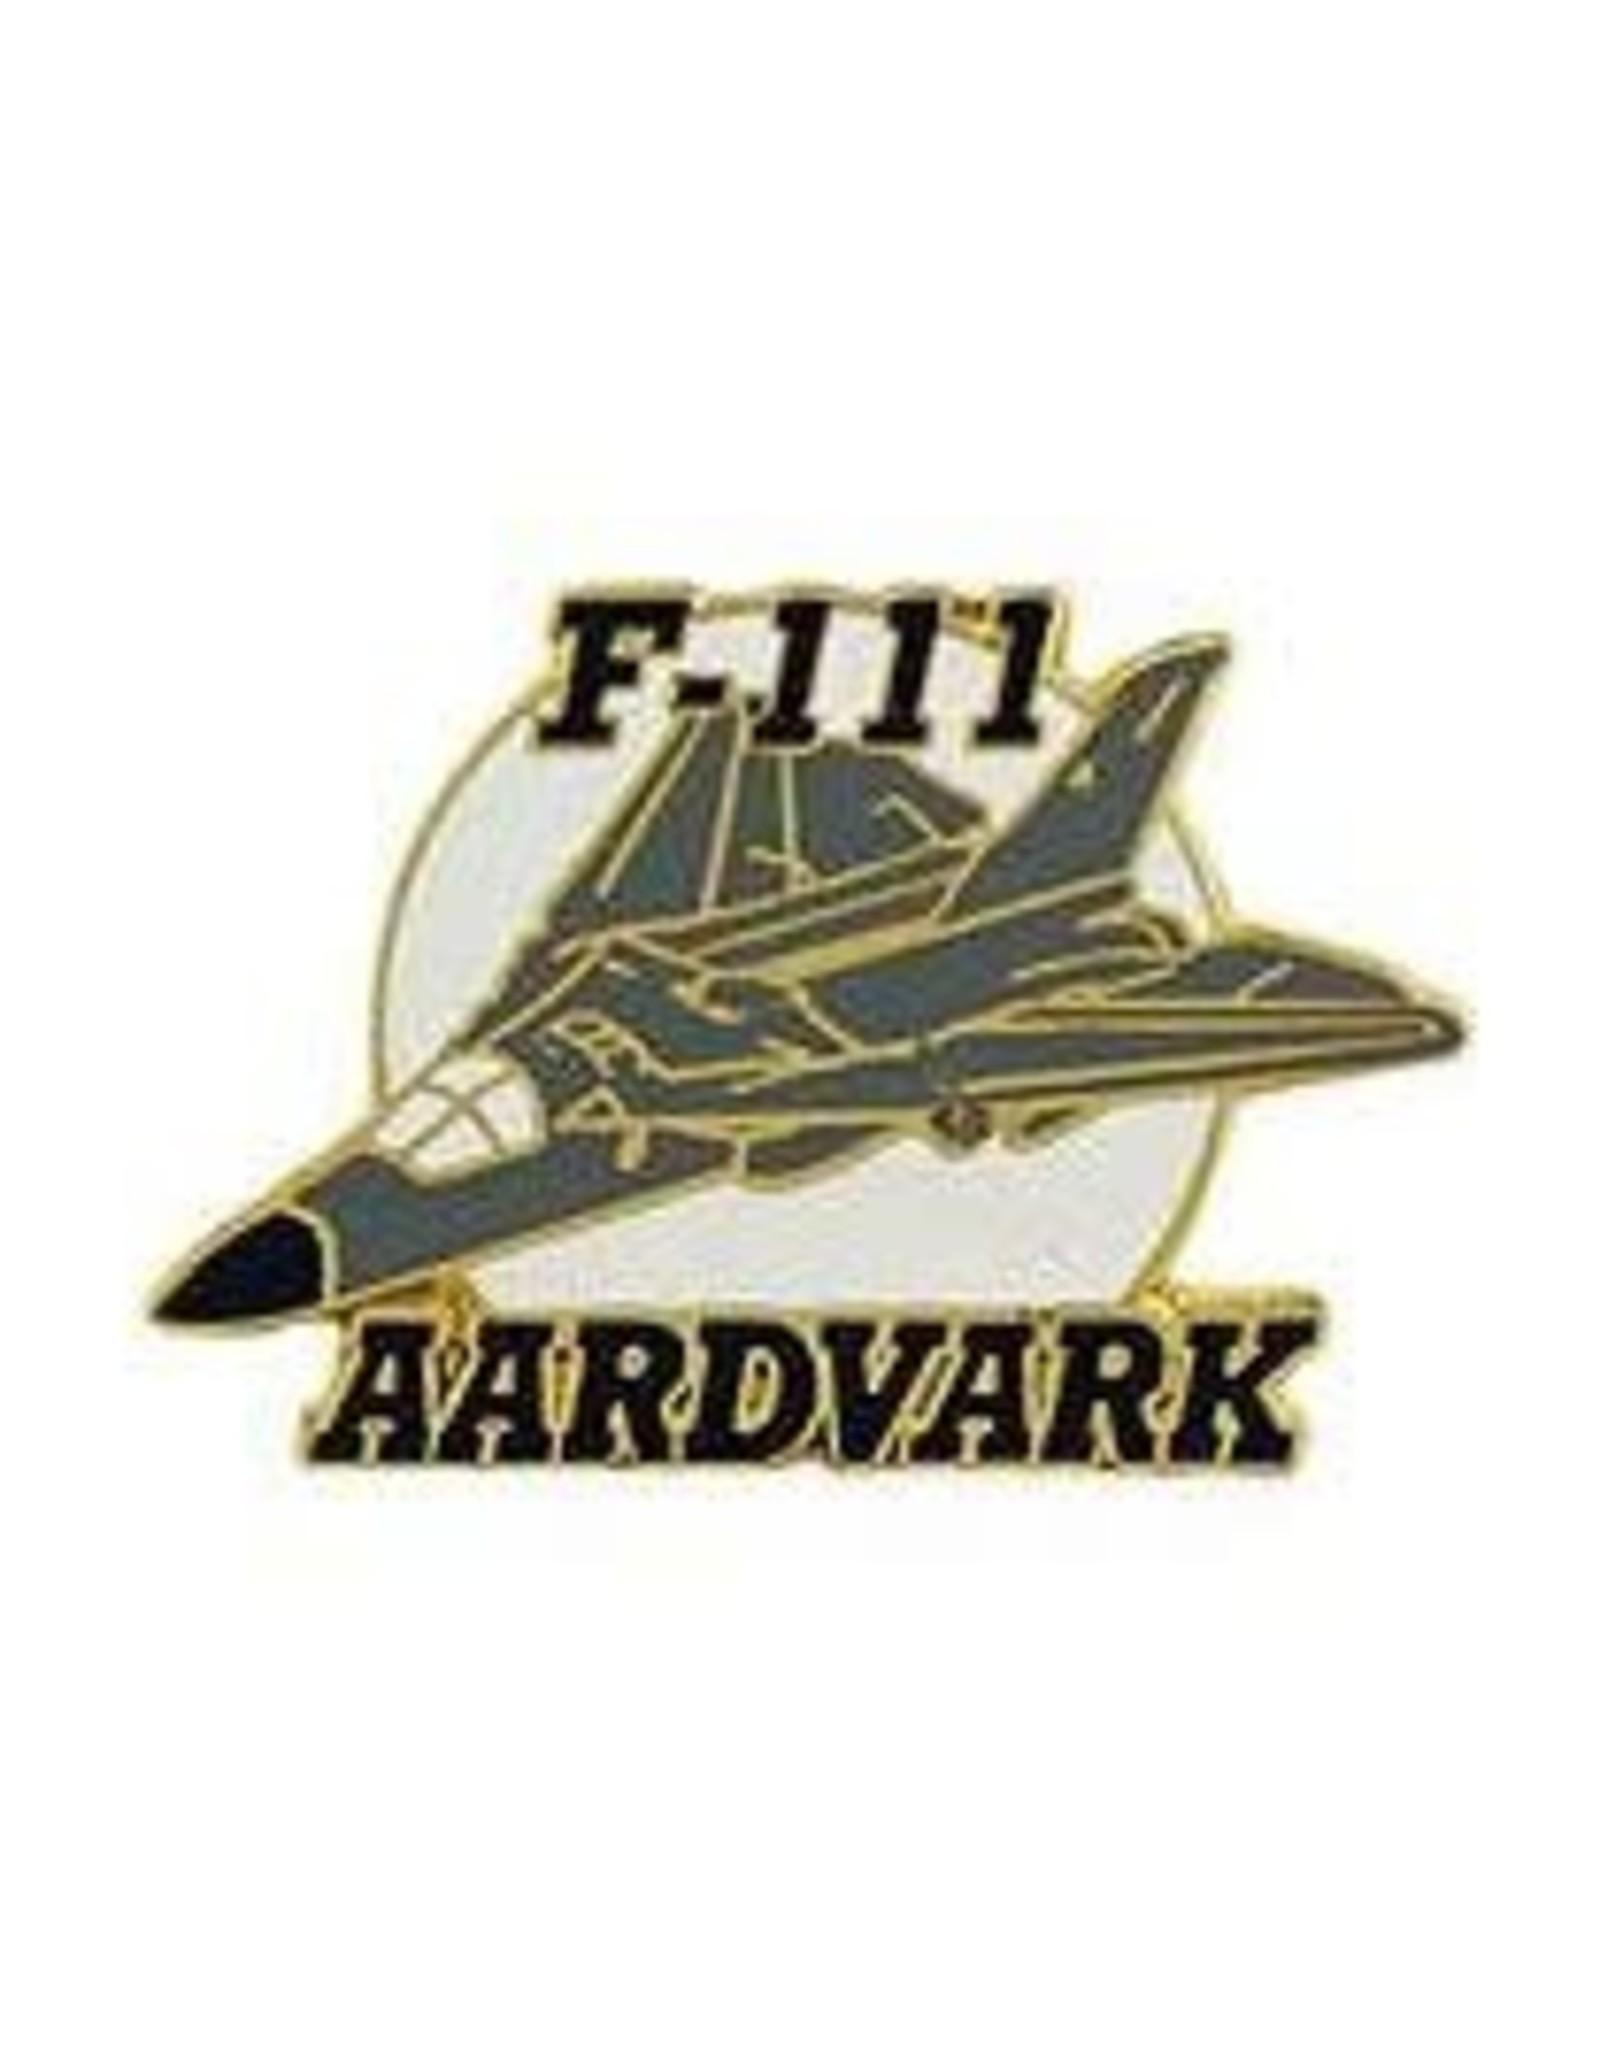 Pin - Airplane F-111 Aardvark